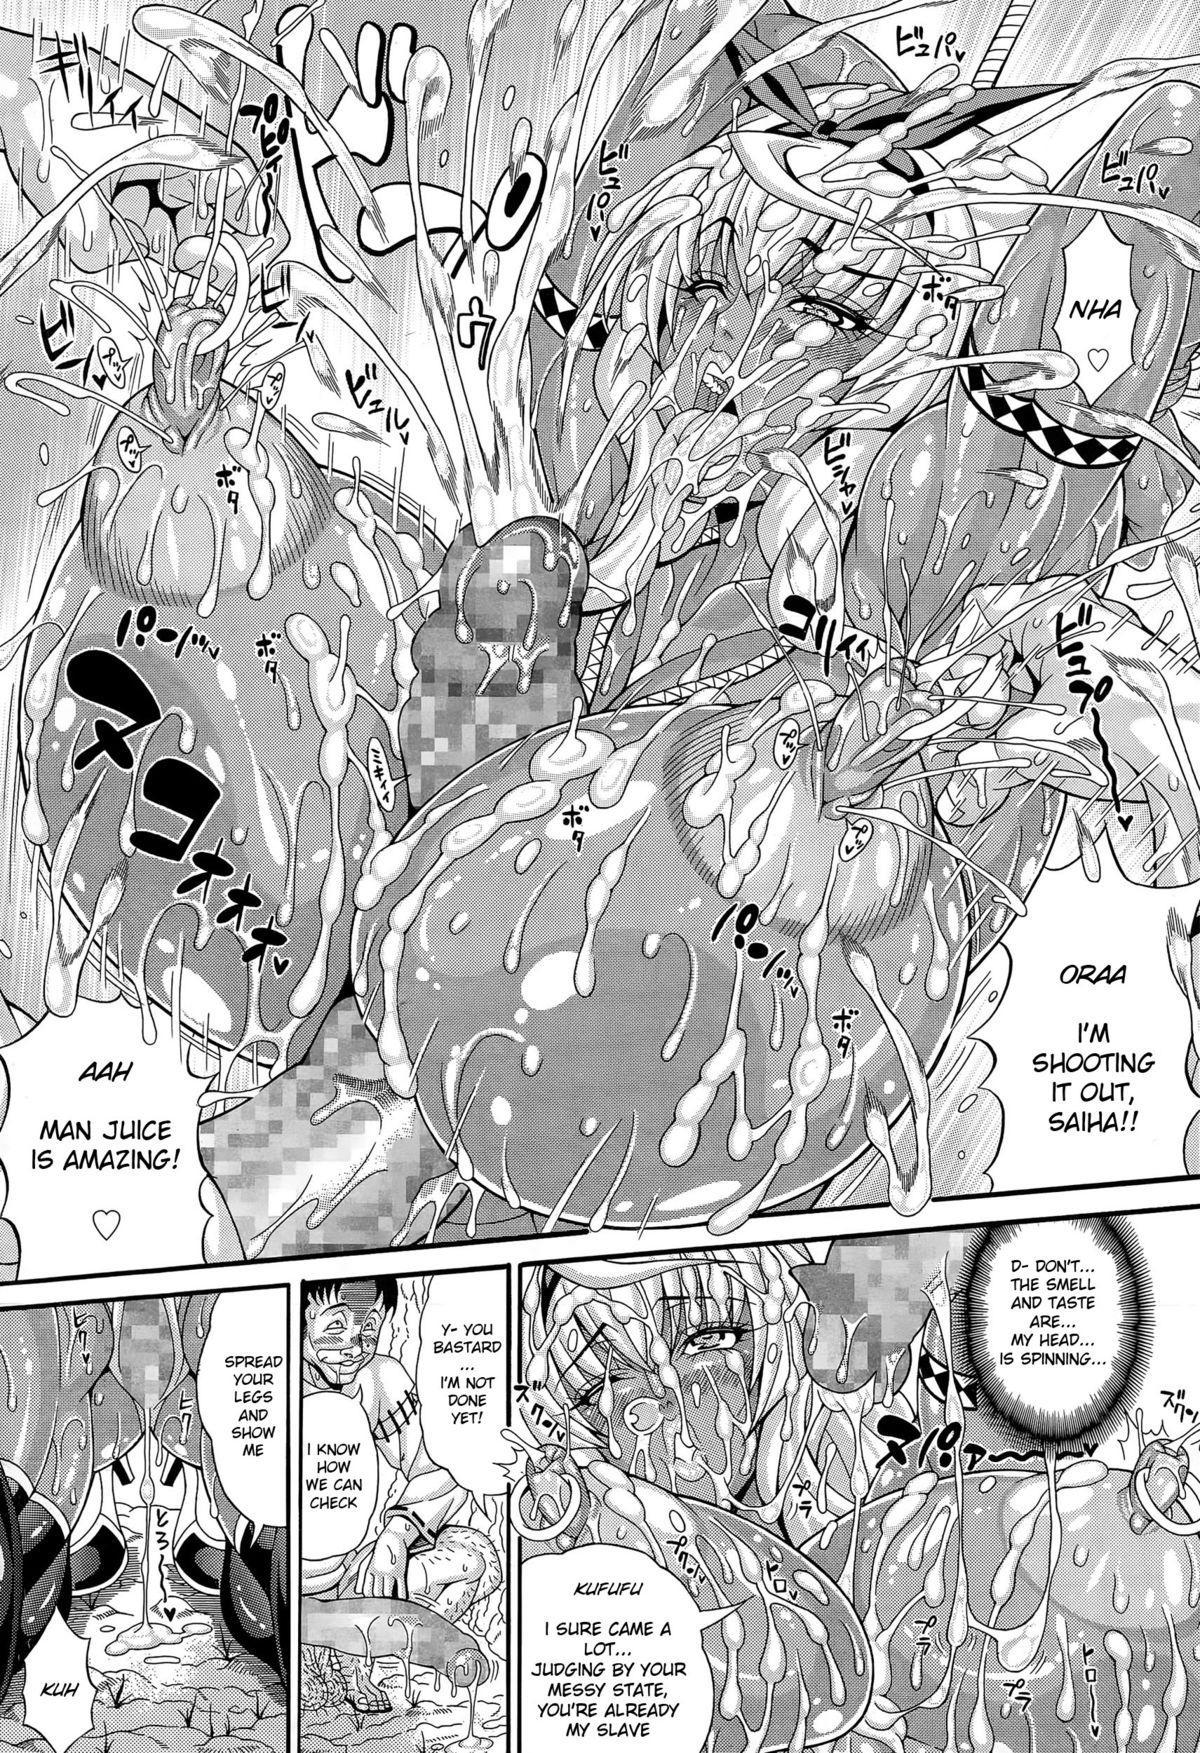 [Andou Hiroyuki] Mahoutsukai Musou ~Sengoku Pakohime Kasshoku Kinniku Onna Hen~   Peerless 30 Year Old Virgin - Warring States Muscled Brown Fuck Princess (COMIC Tenma 2015-06) [English] [Natty Translations] 11